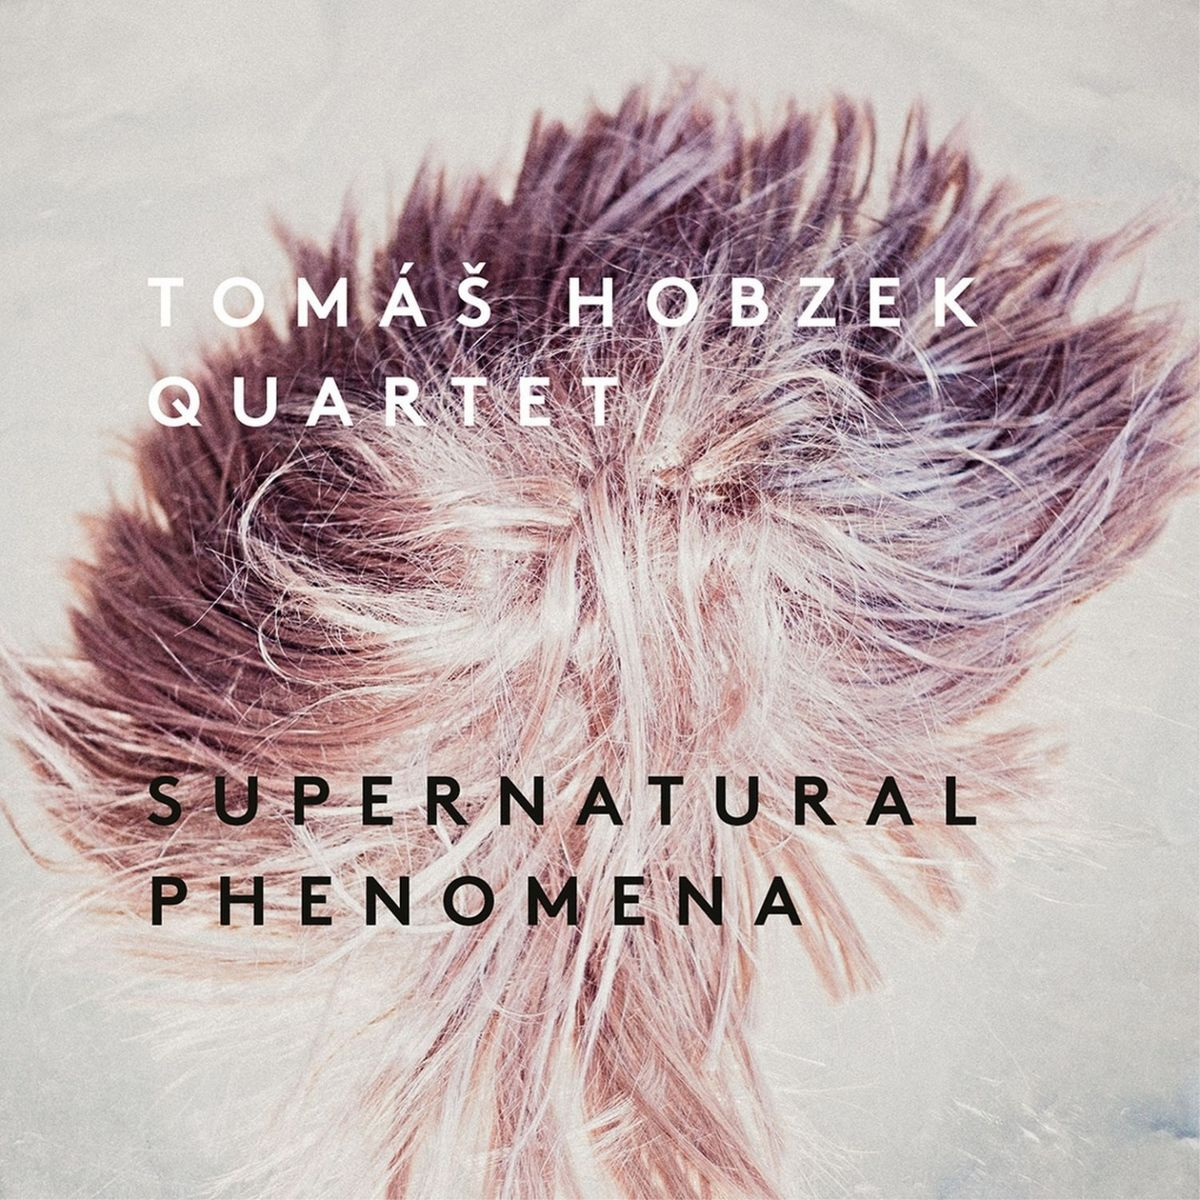 Tomáš Hobzek Quartet - Supernatural phenomena (2019)